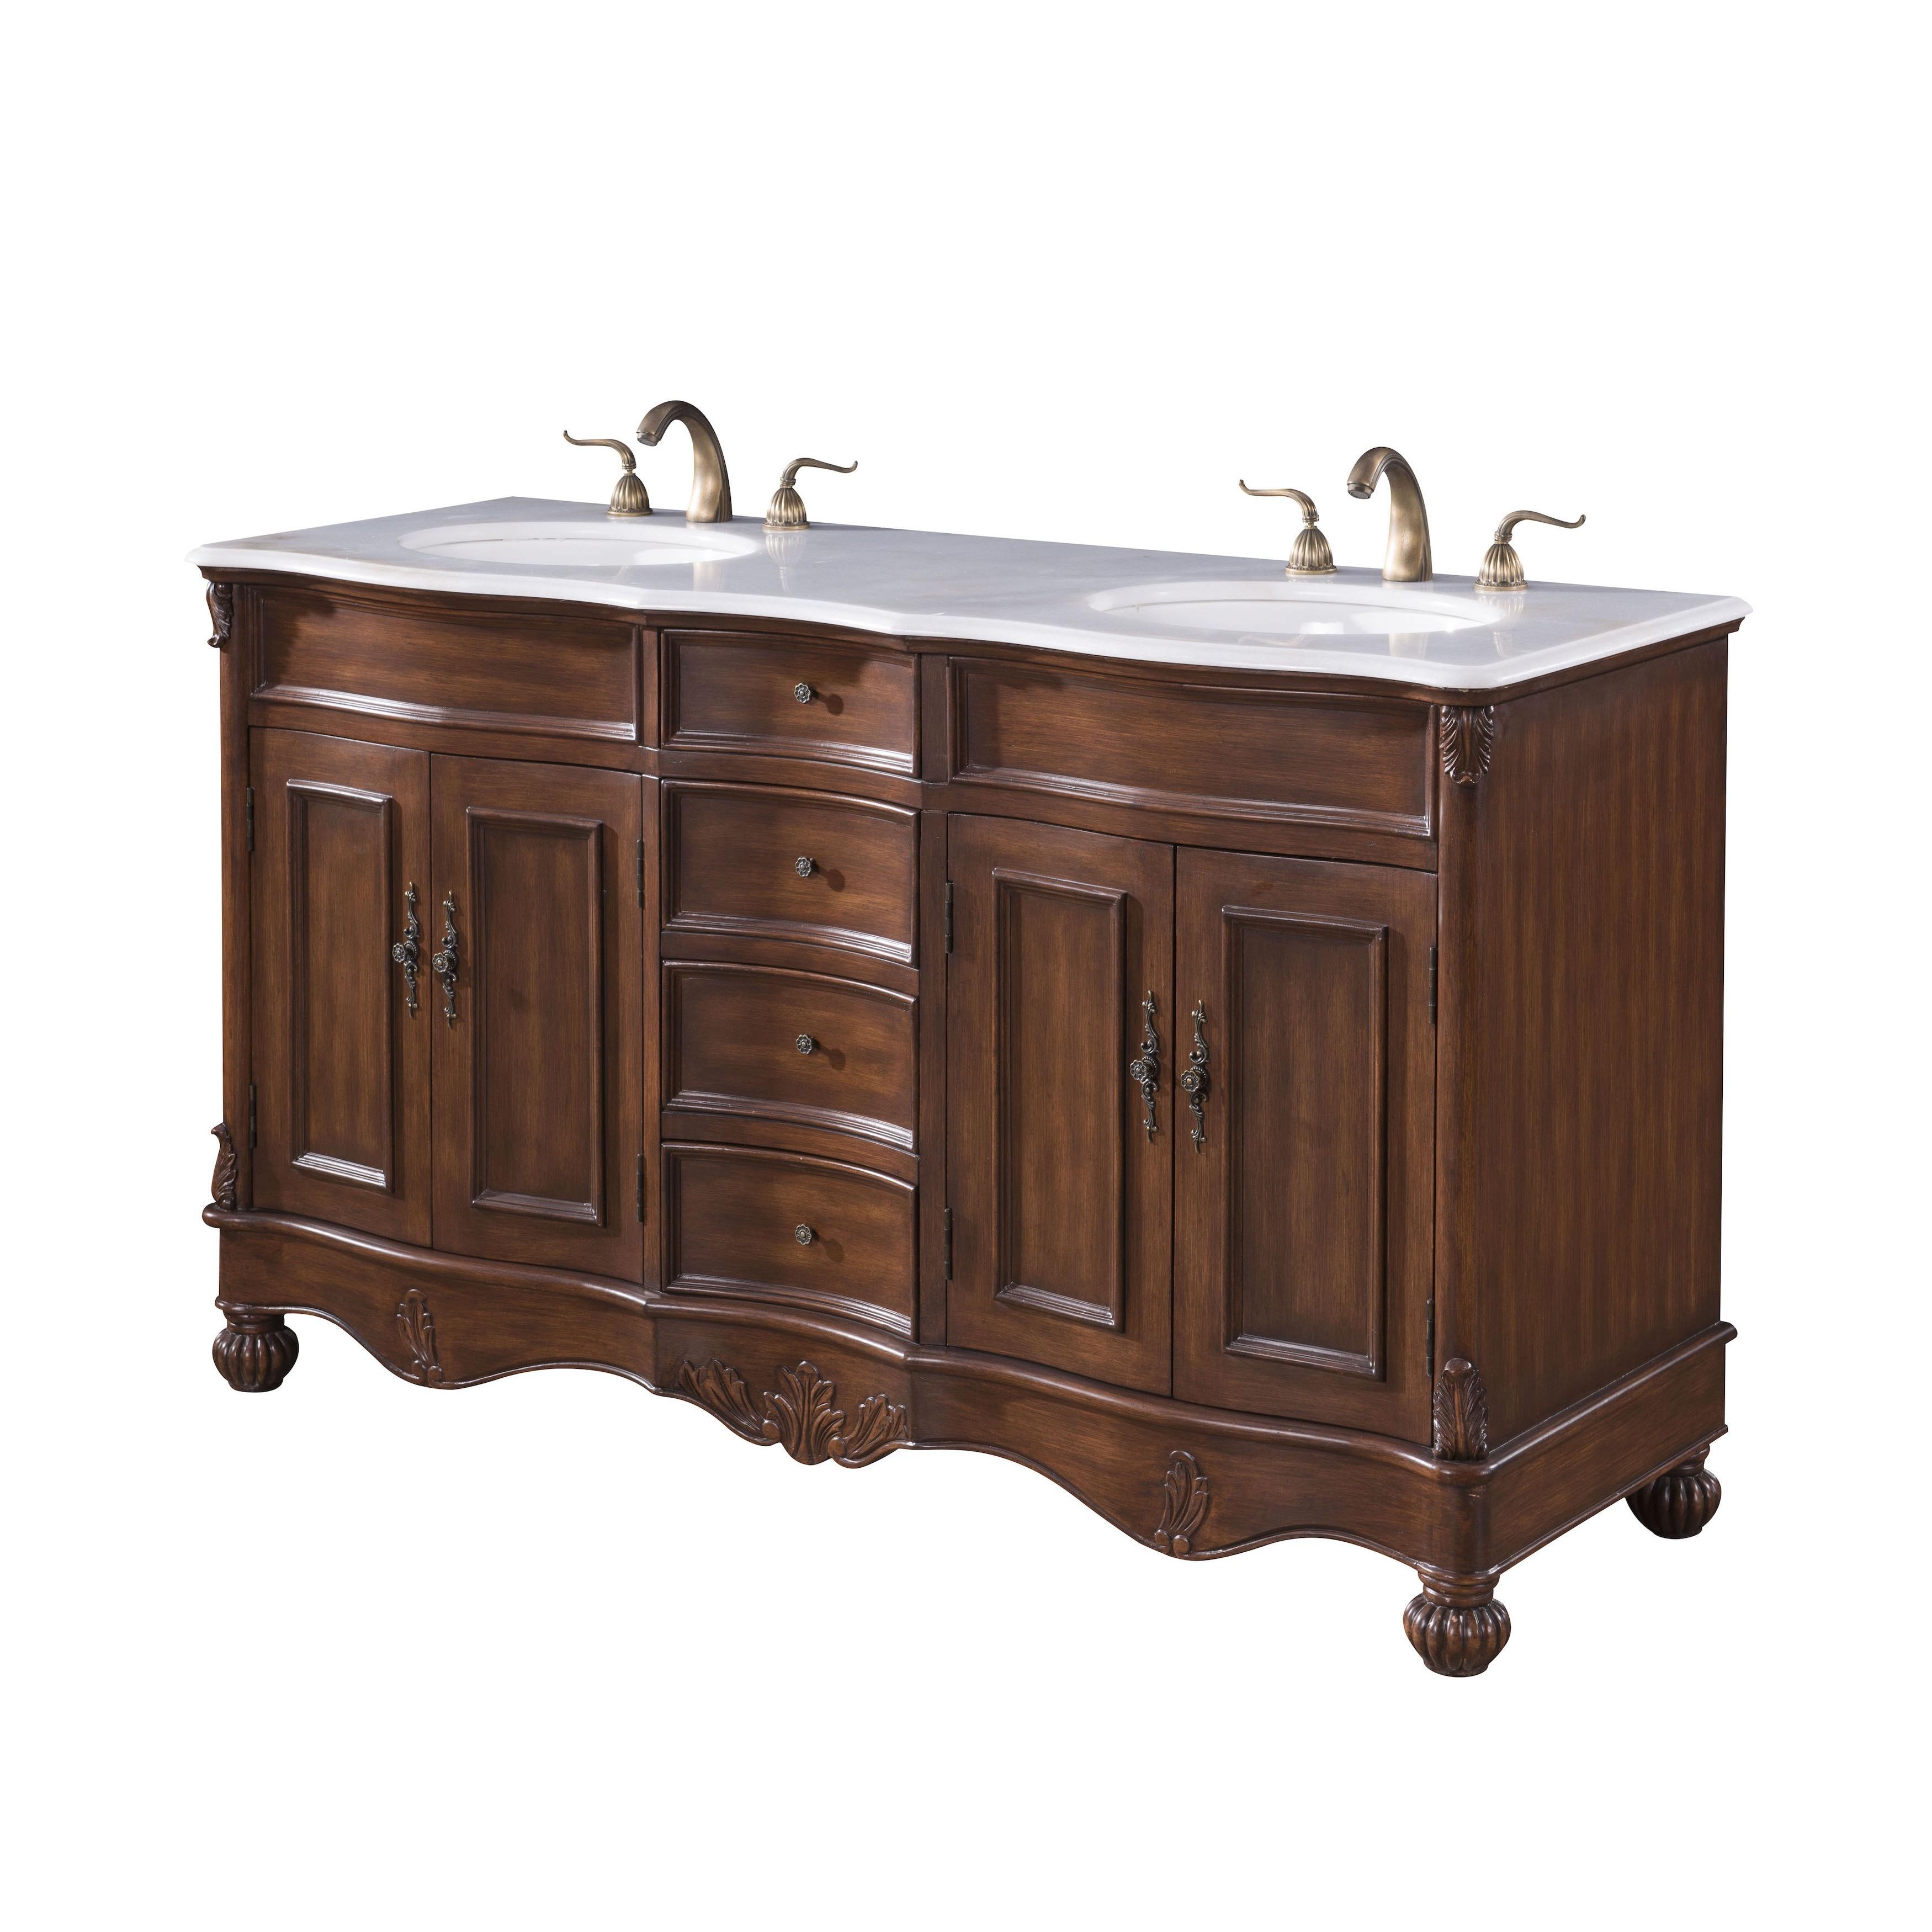 Elegant Lighting Windsor 60-inch Double Bathroom Vanity - Free ...